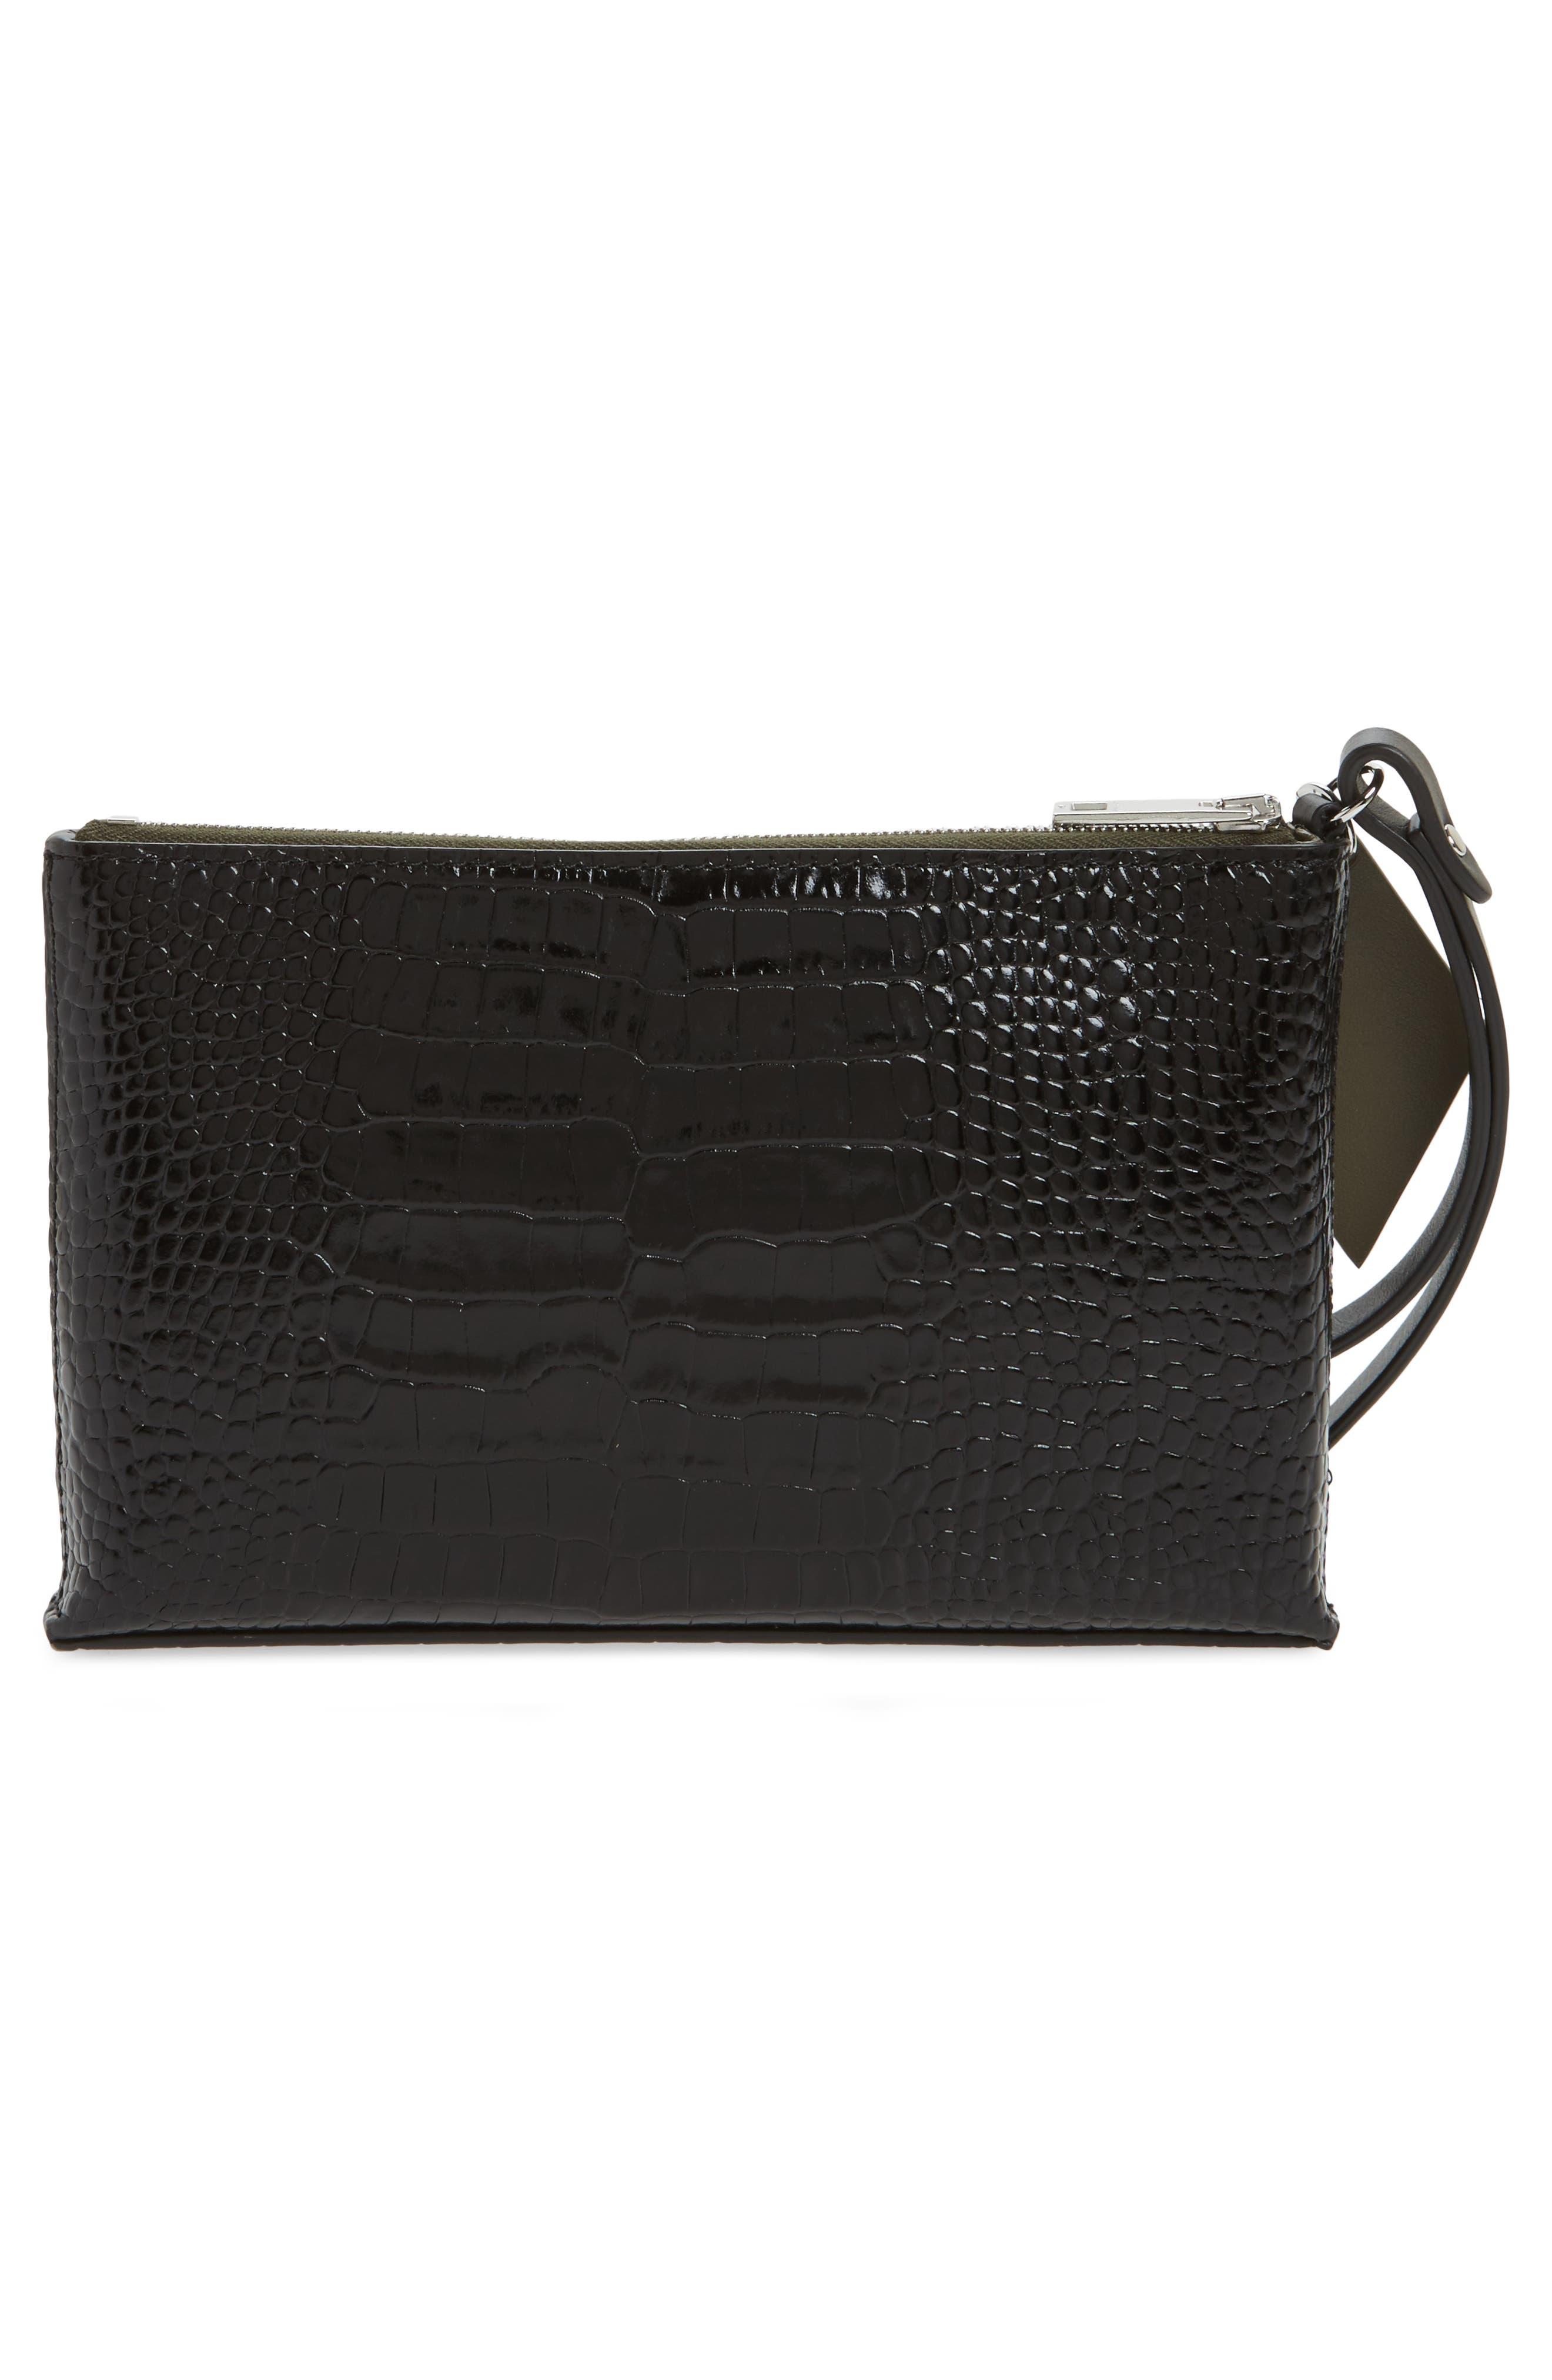 Croc Embossed Leather Wristlet,                             Alternate thumbnail 3, color,                             BLACK CROCO